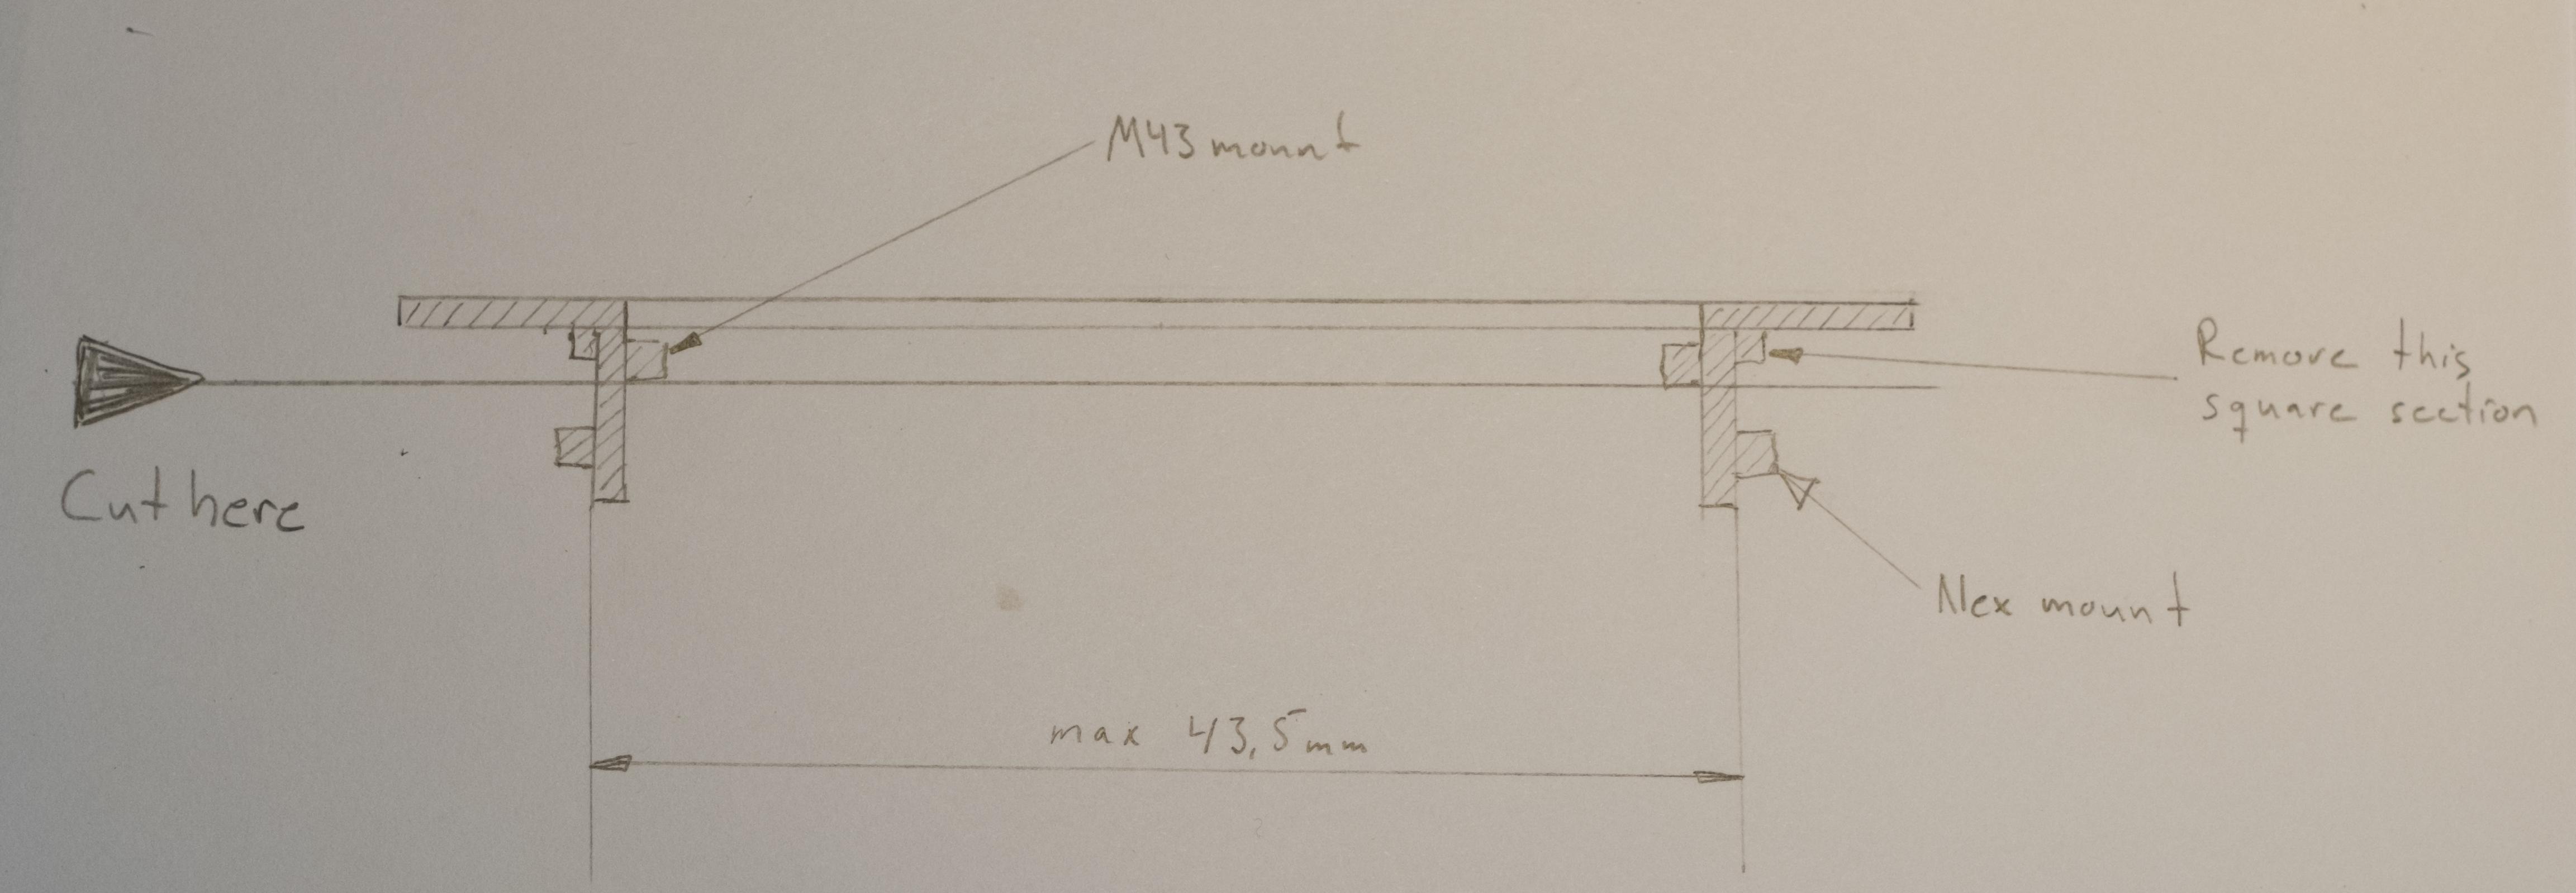 Leica R LR lens to M4/3 Micro Four Thirds MFT mount adapter